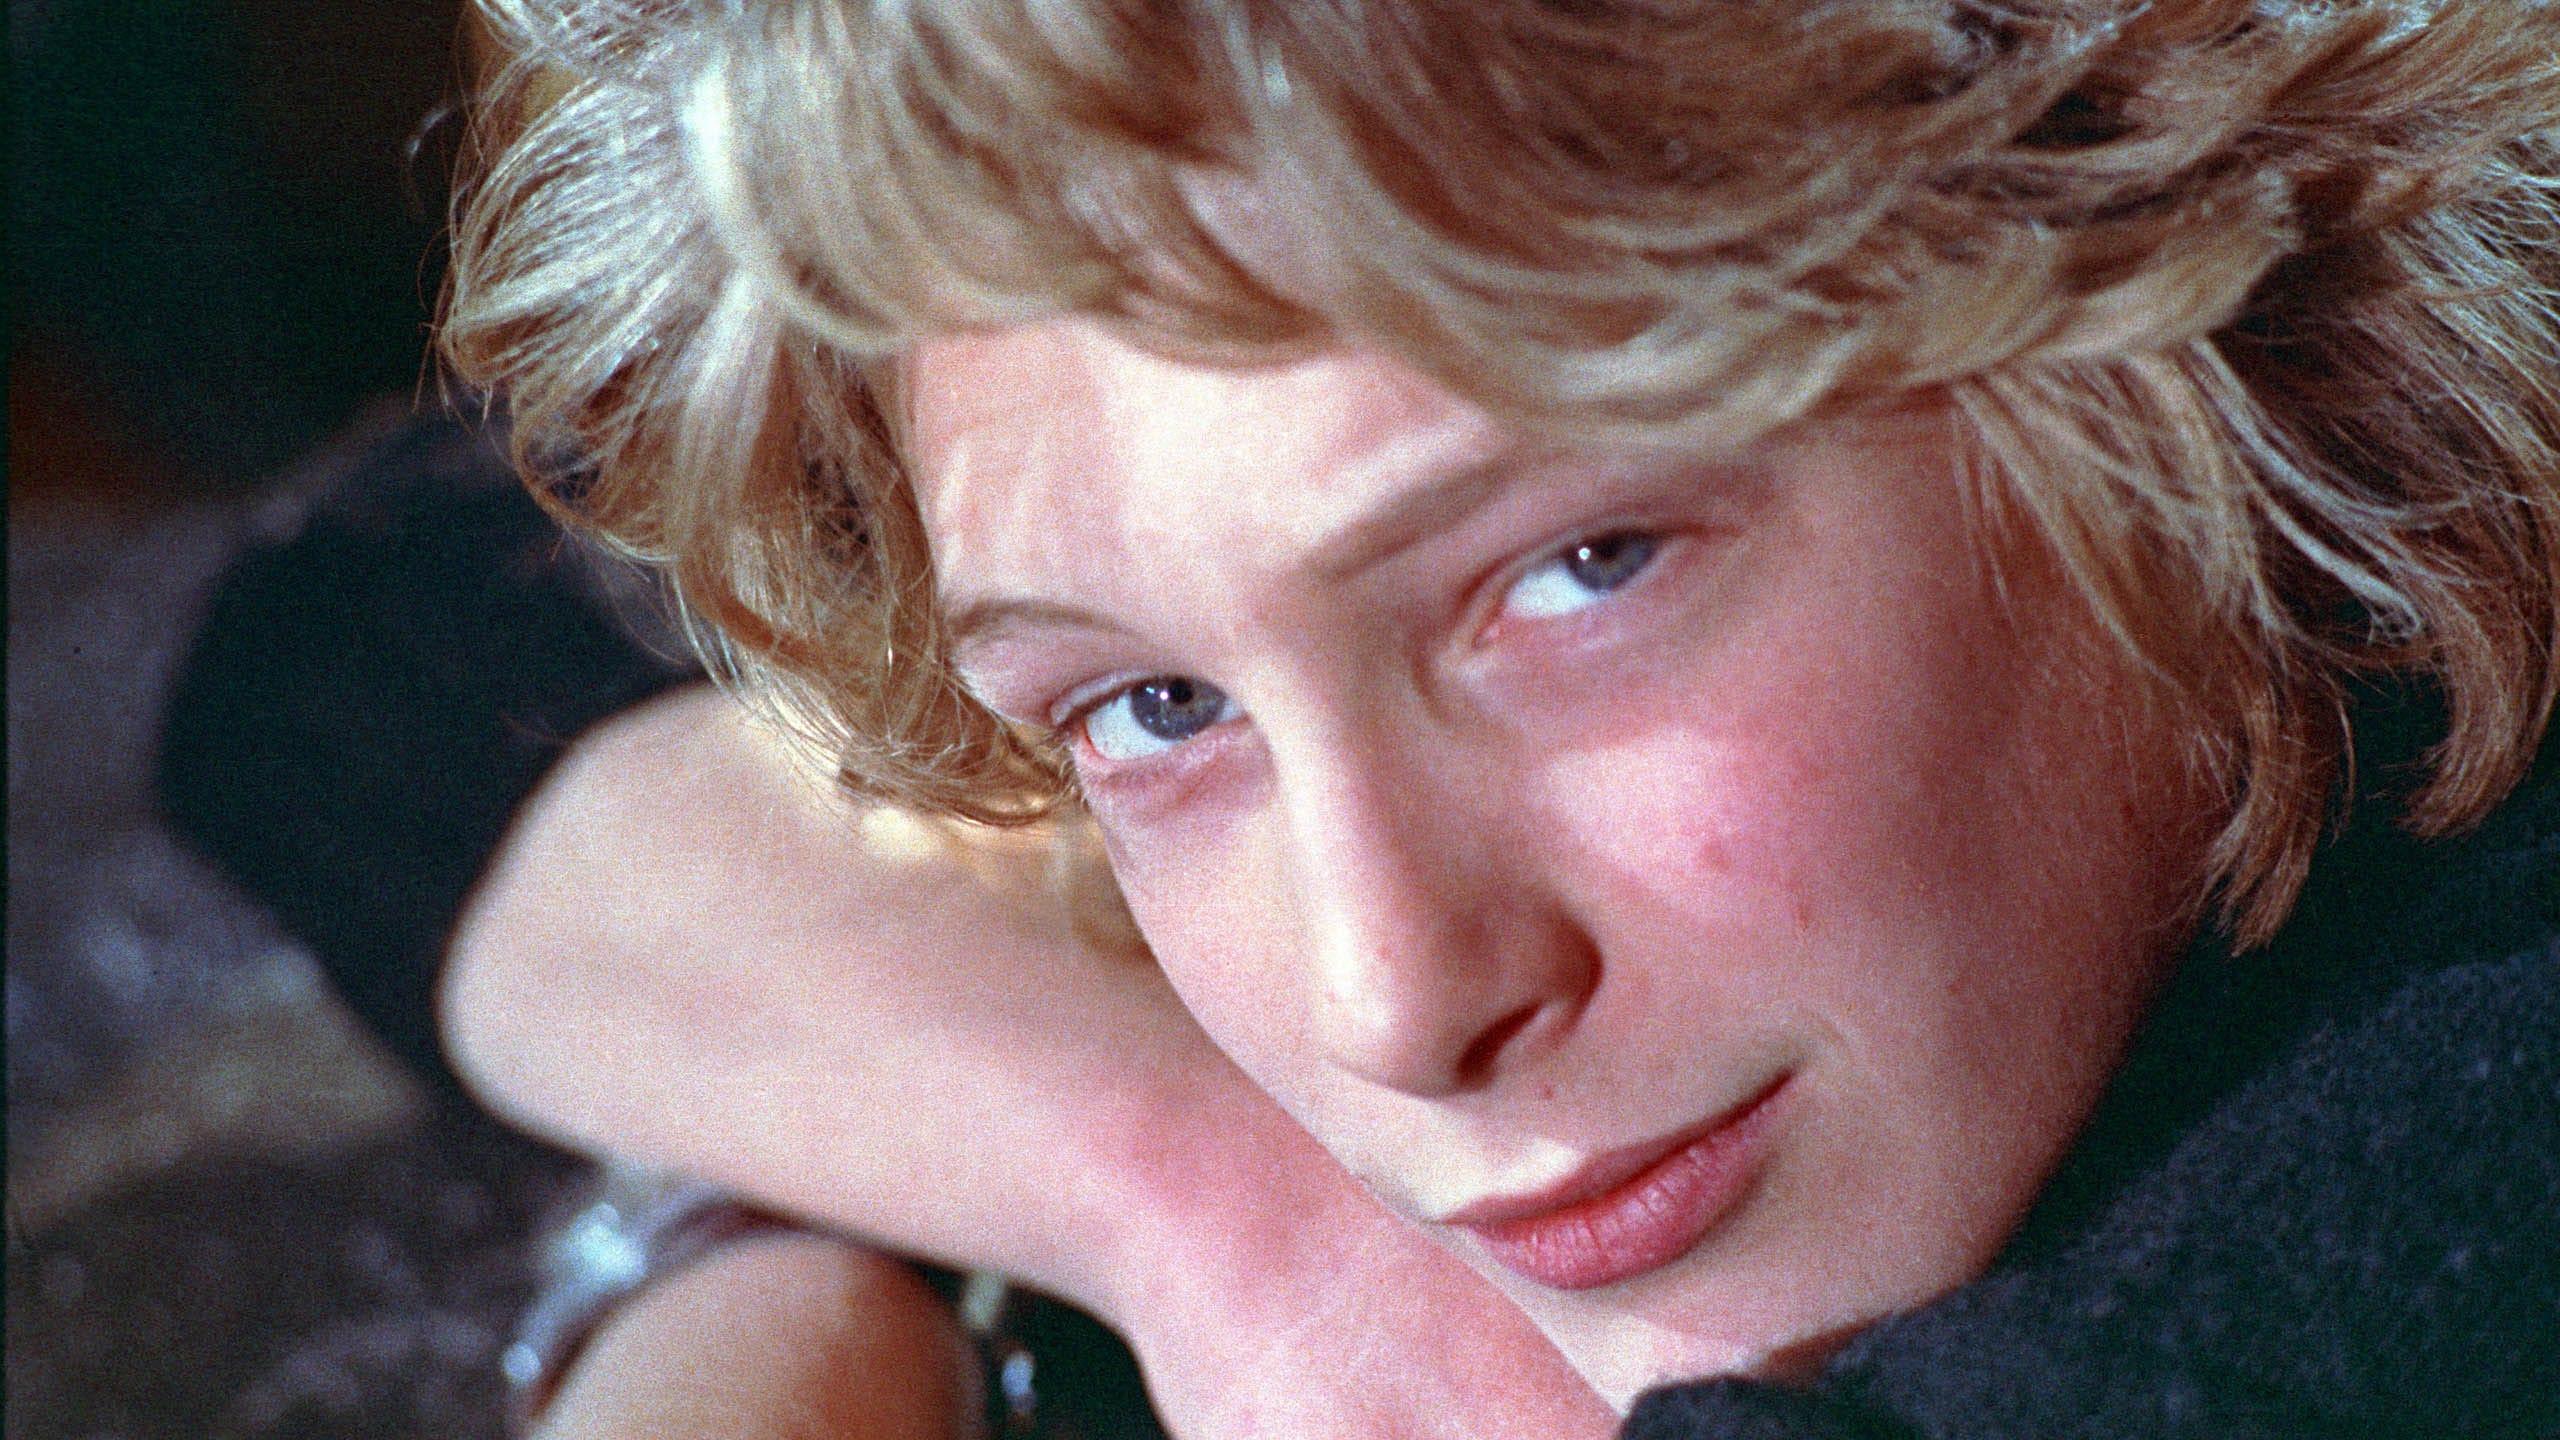 Beautiful boy  subject of Swedish documentary showing during Sundance program at Gateway